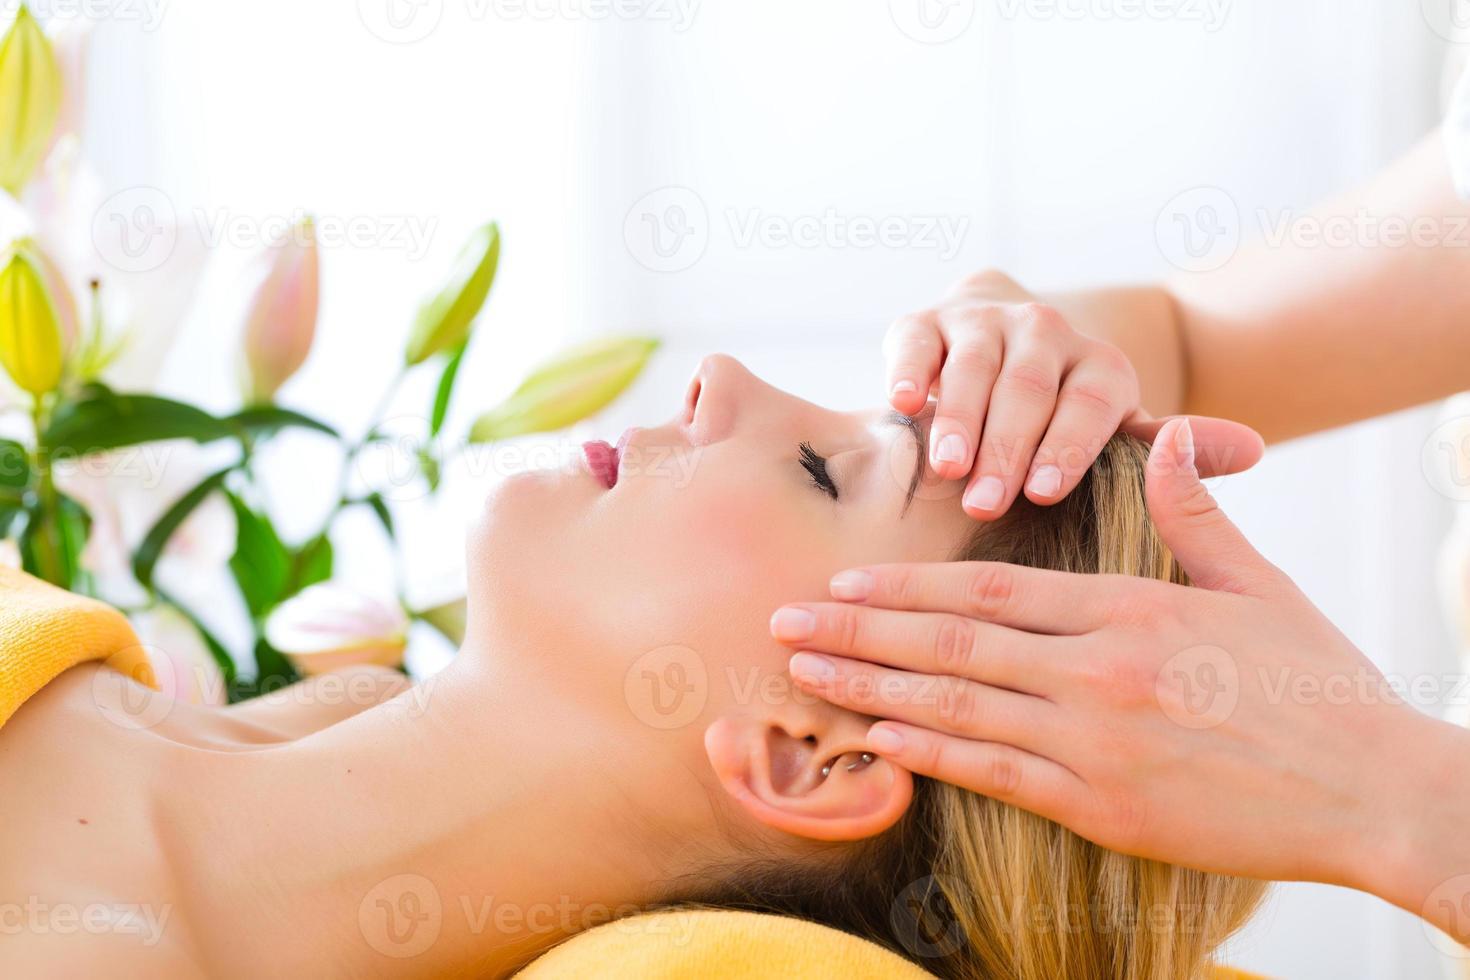 Wellness - woman getting head massage in Spa photo